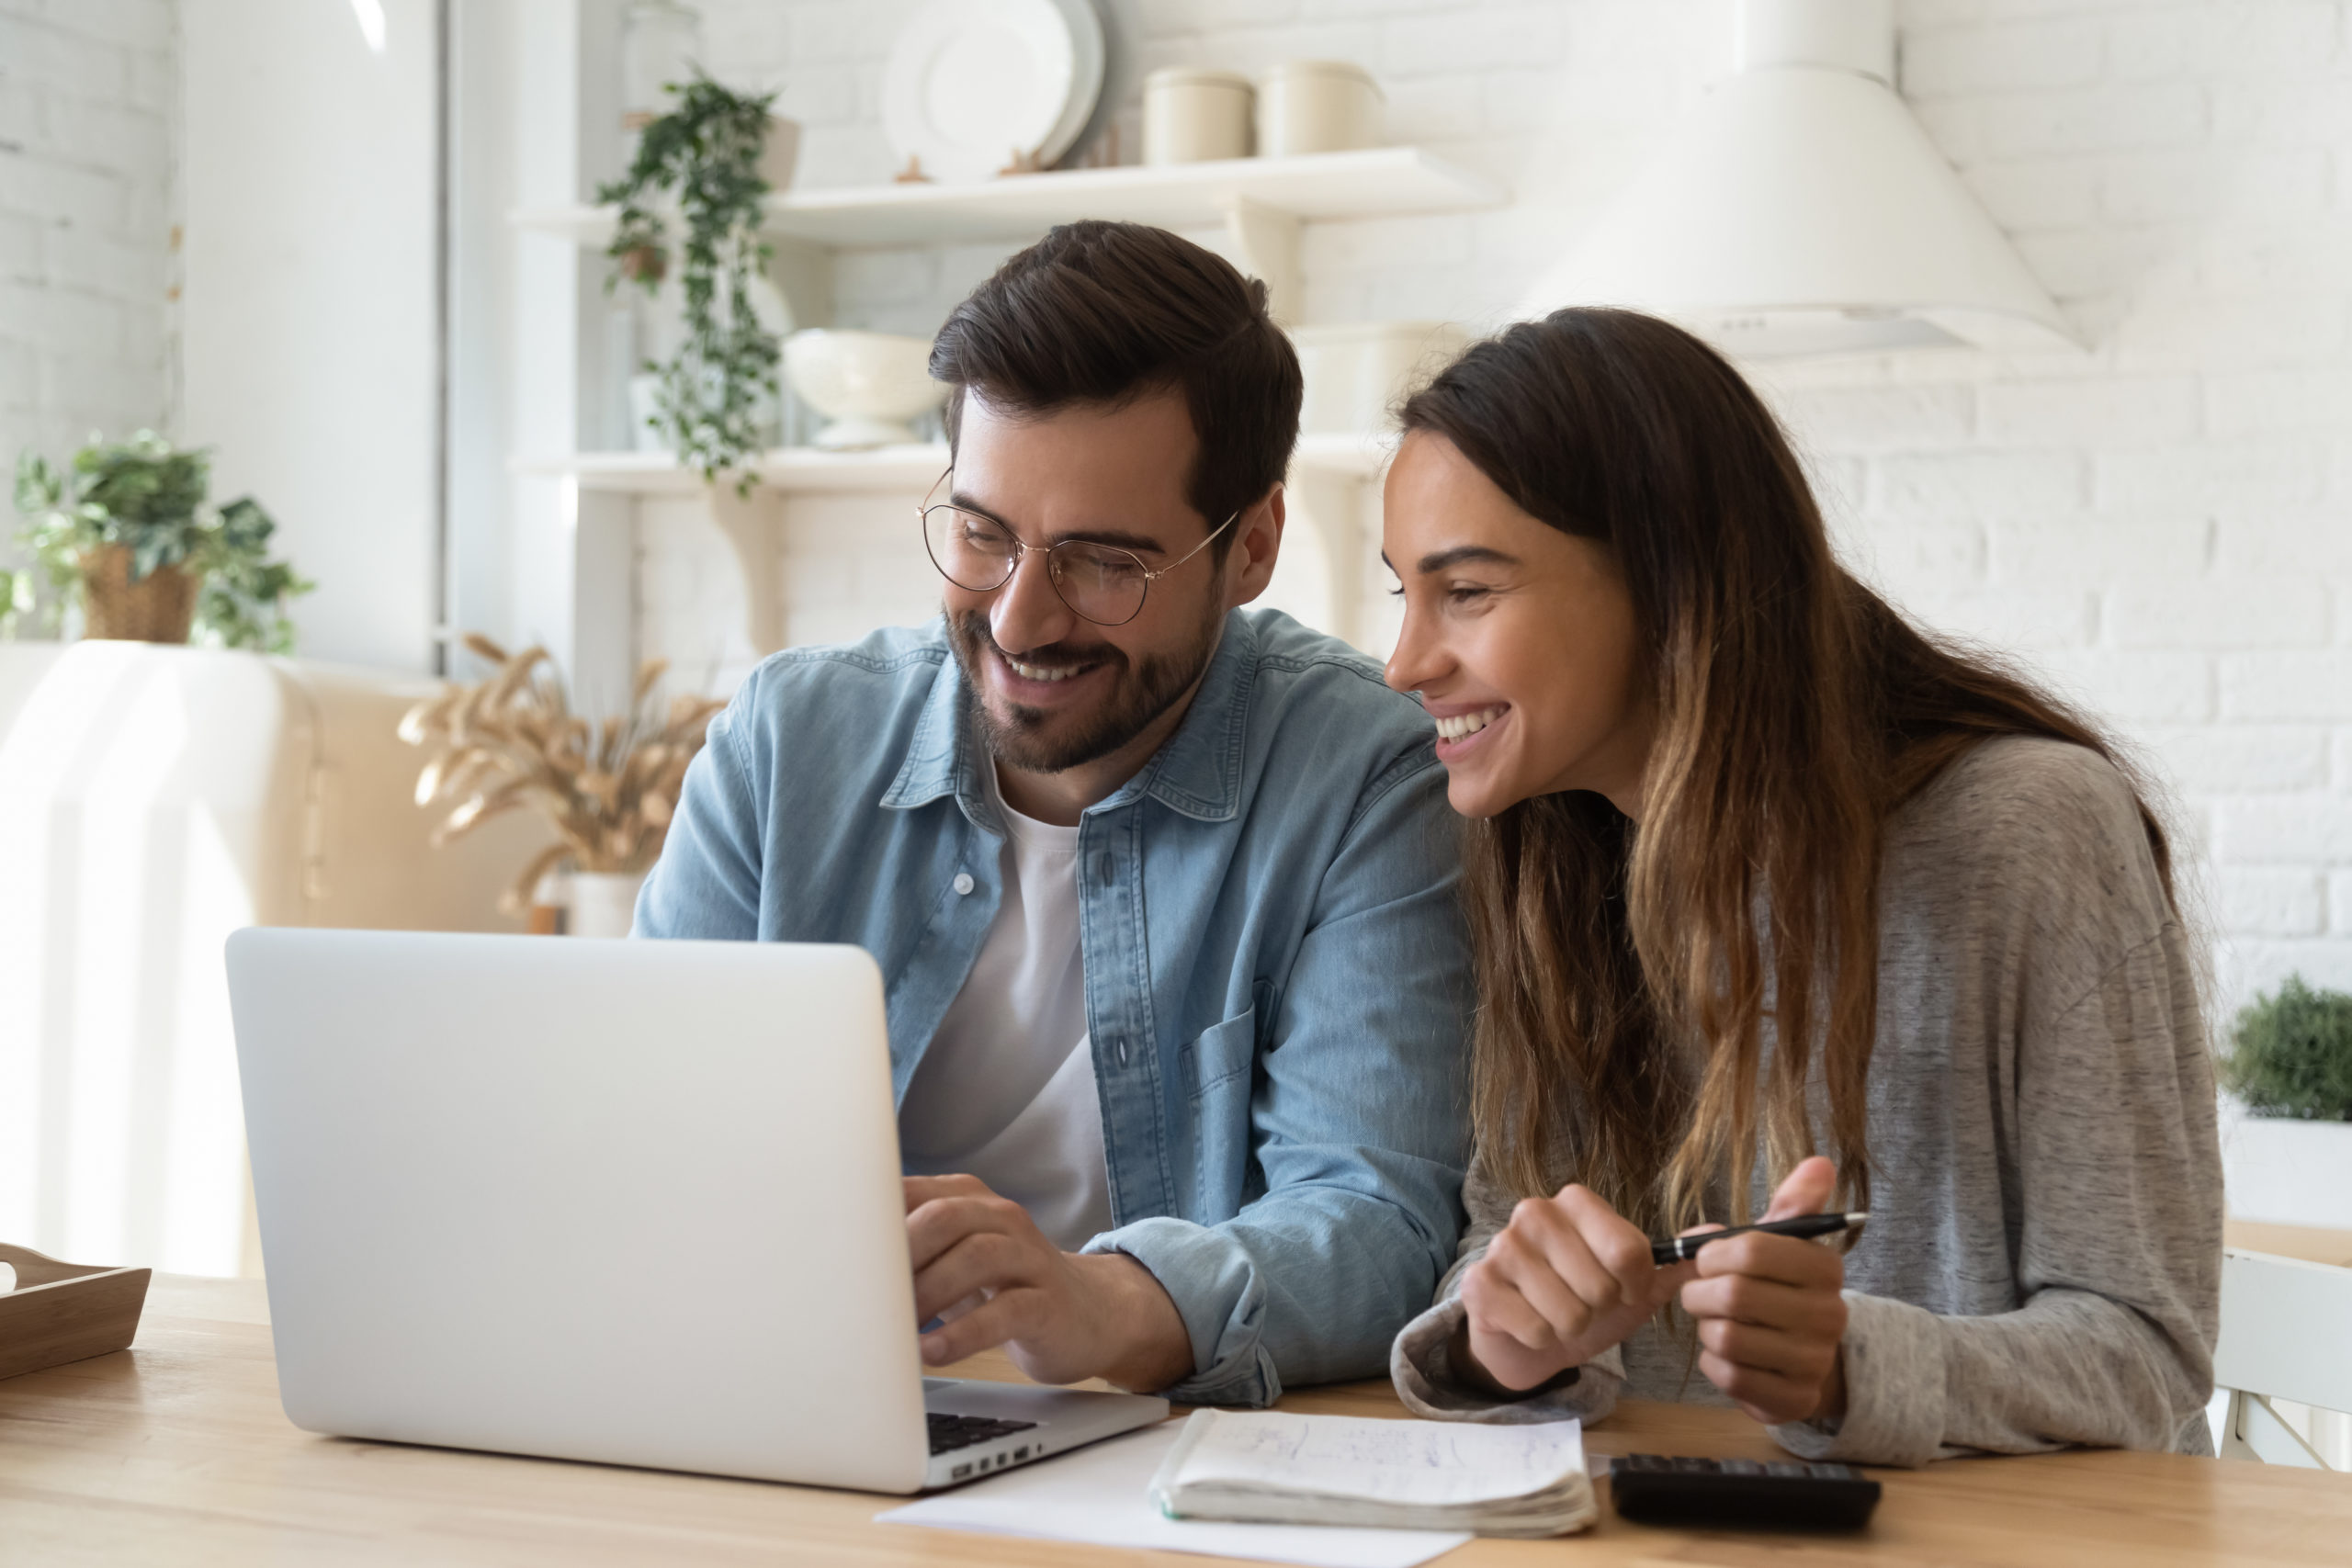 kredyt oddluzeniowy - para skladajaca wniosek o kredyt online